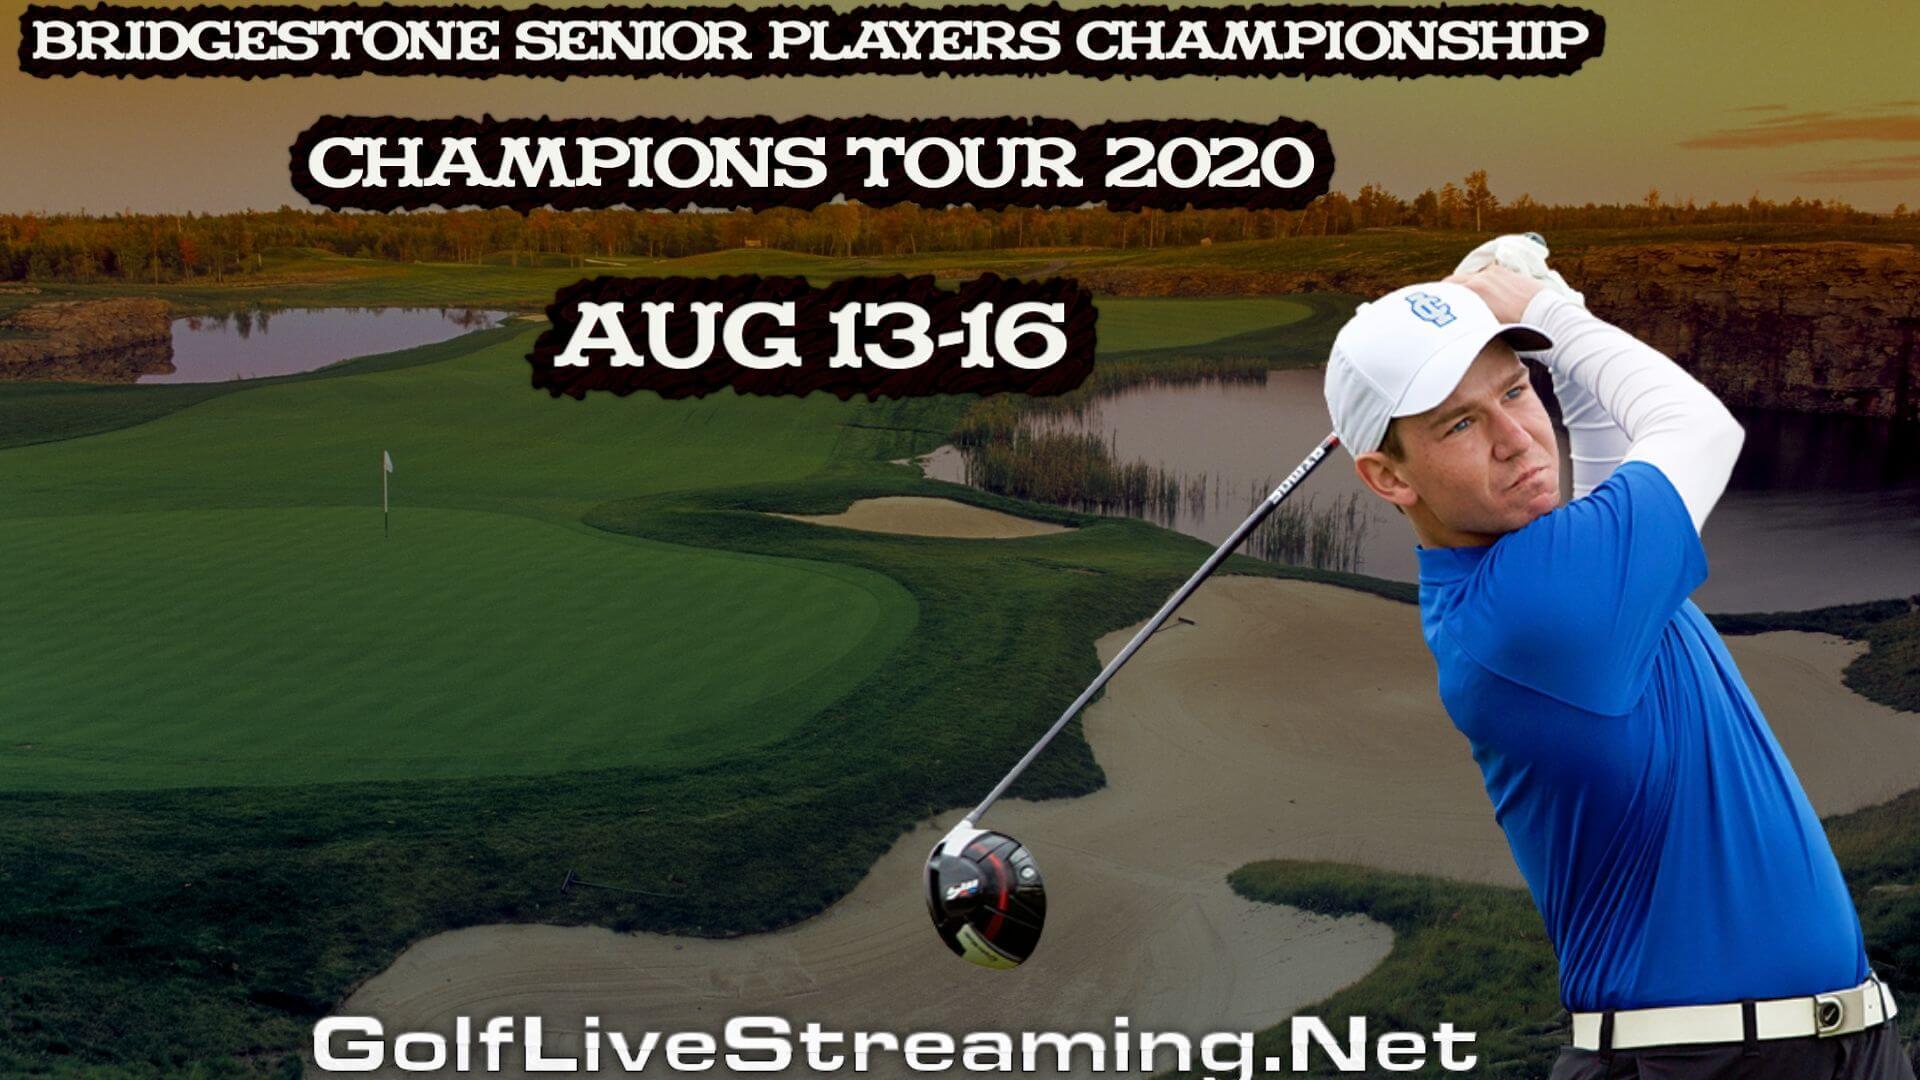 Bridgestone Senior Players Championship Live Stream 2020 | Rd 1